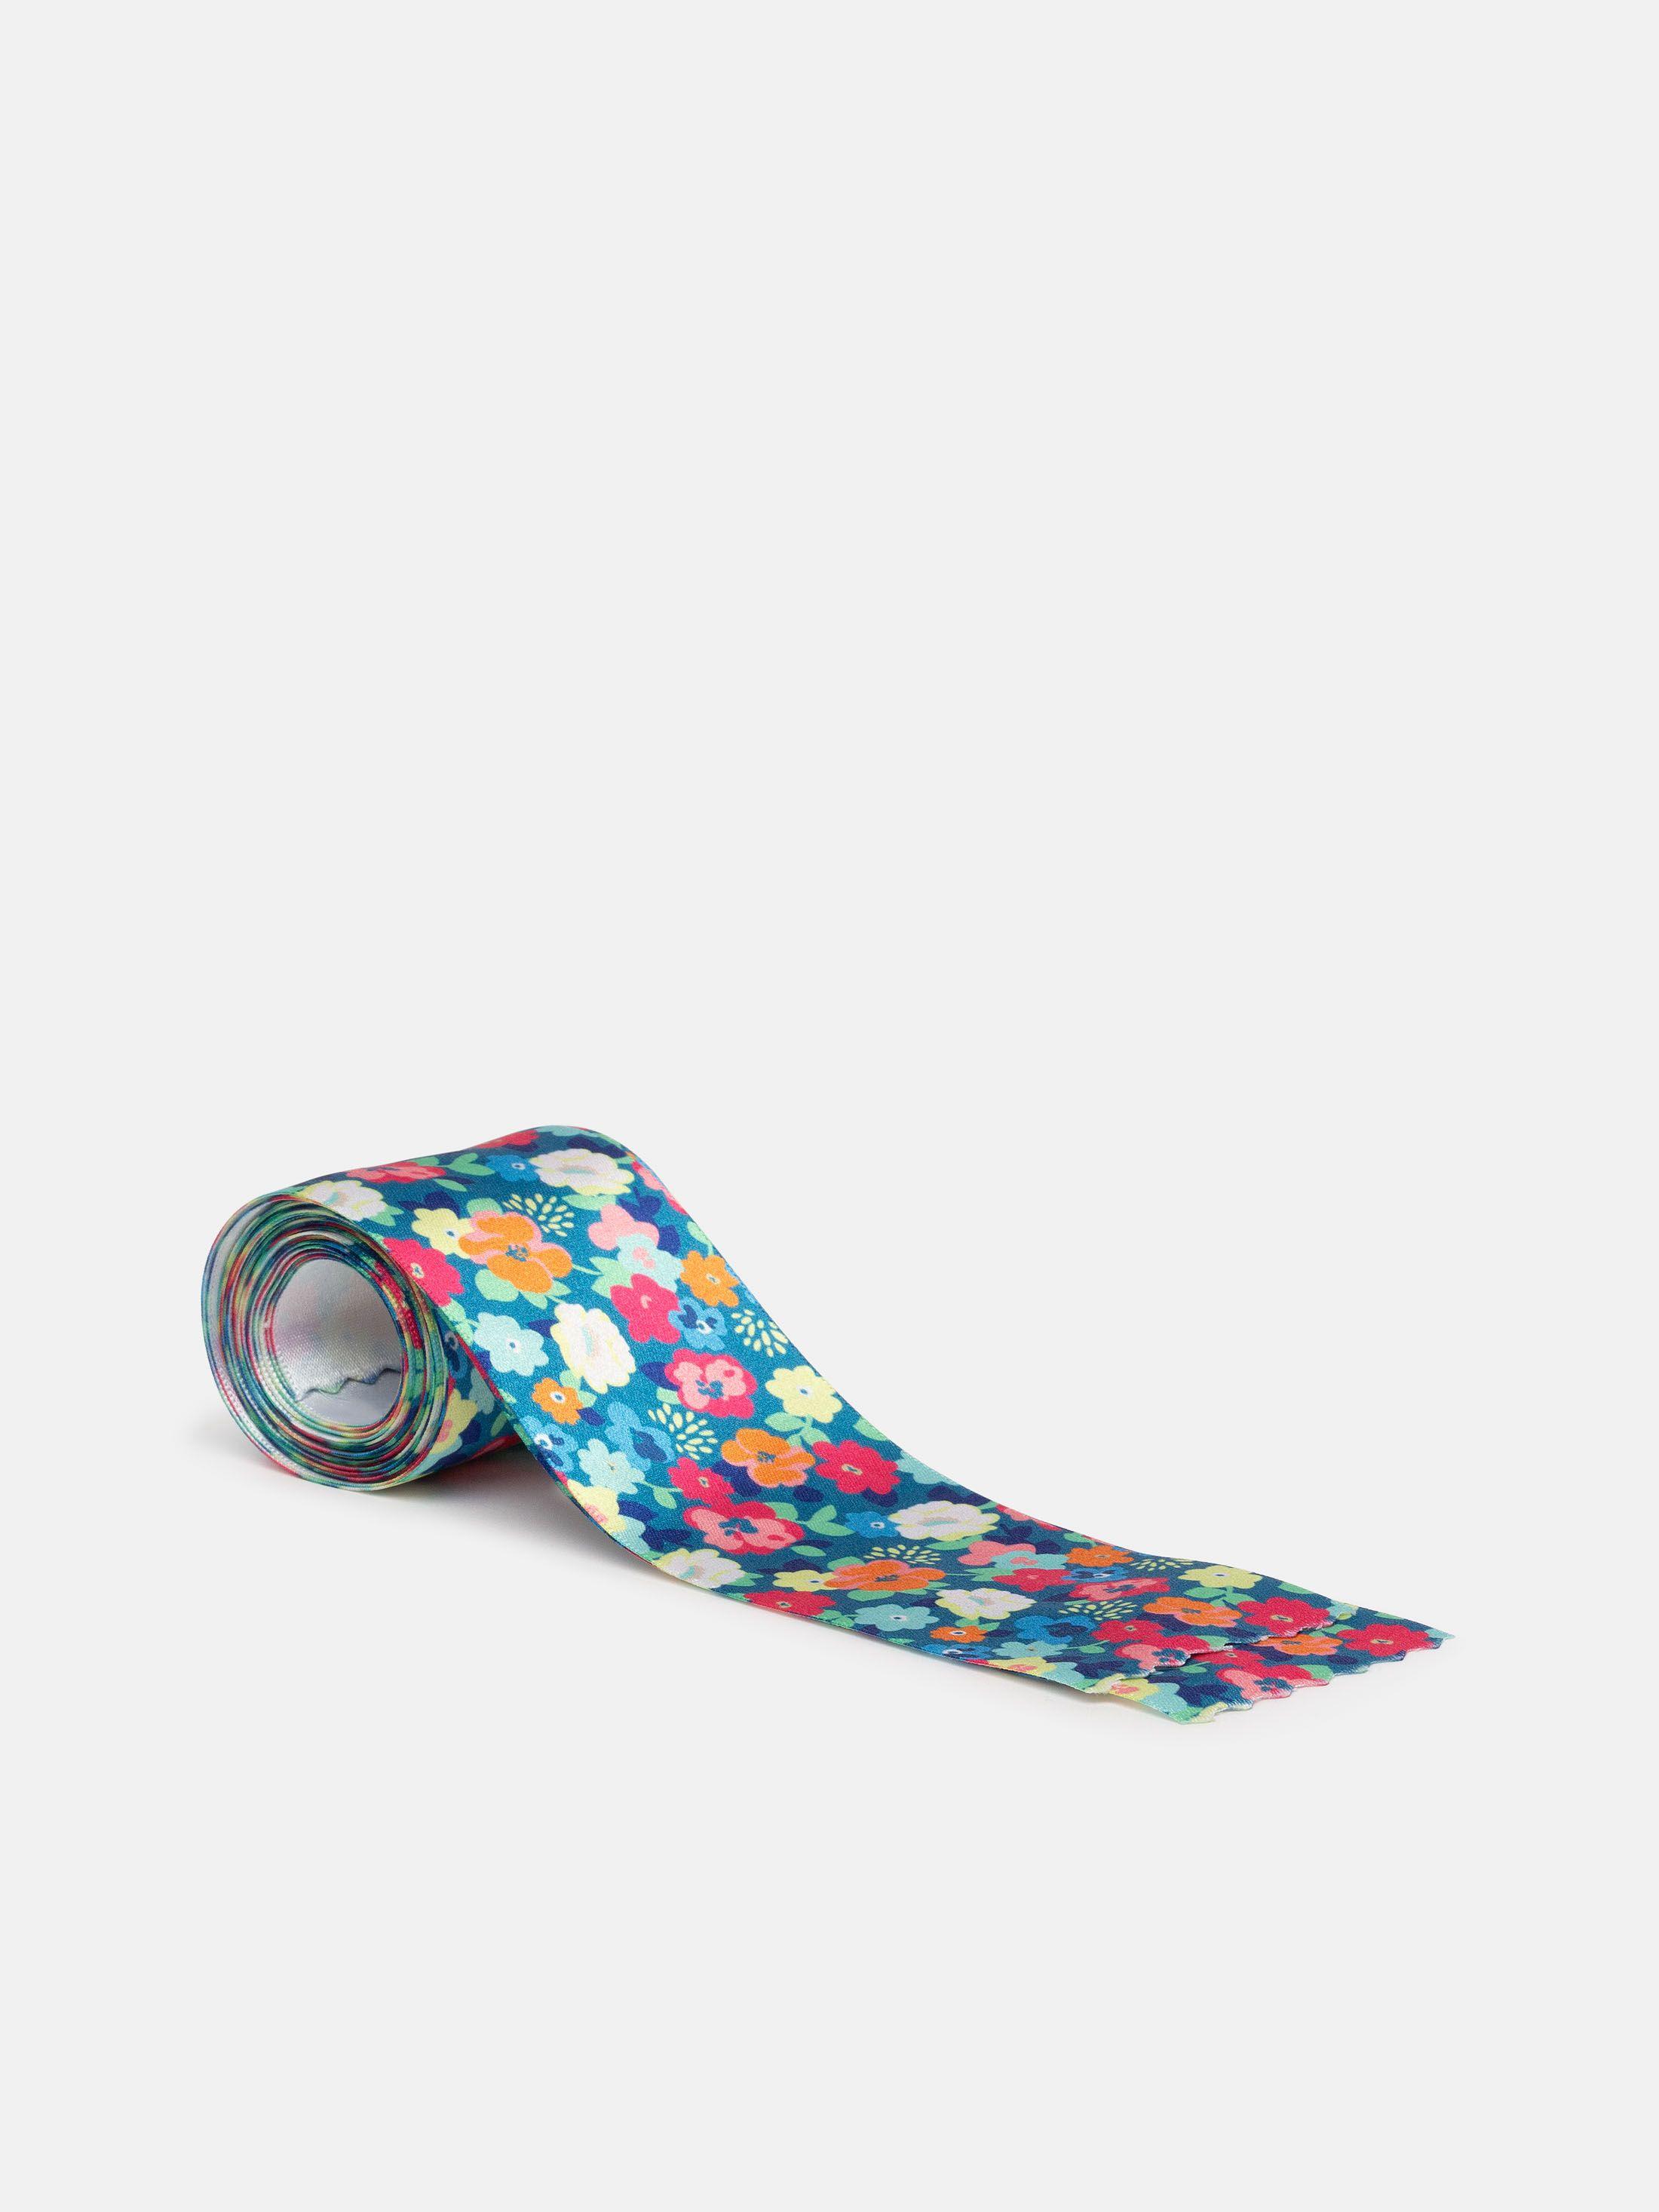 Printed ribbon texture detail